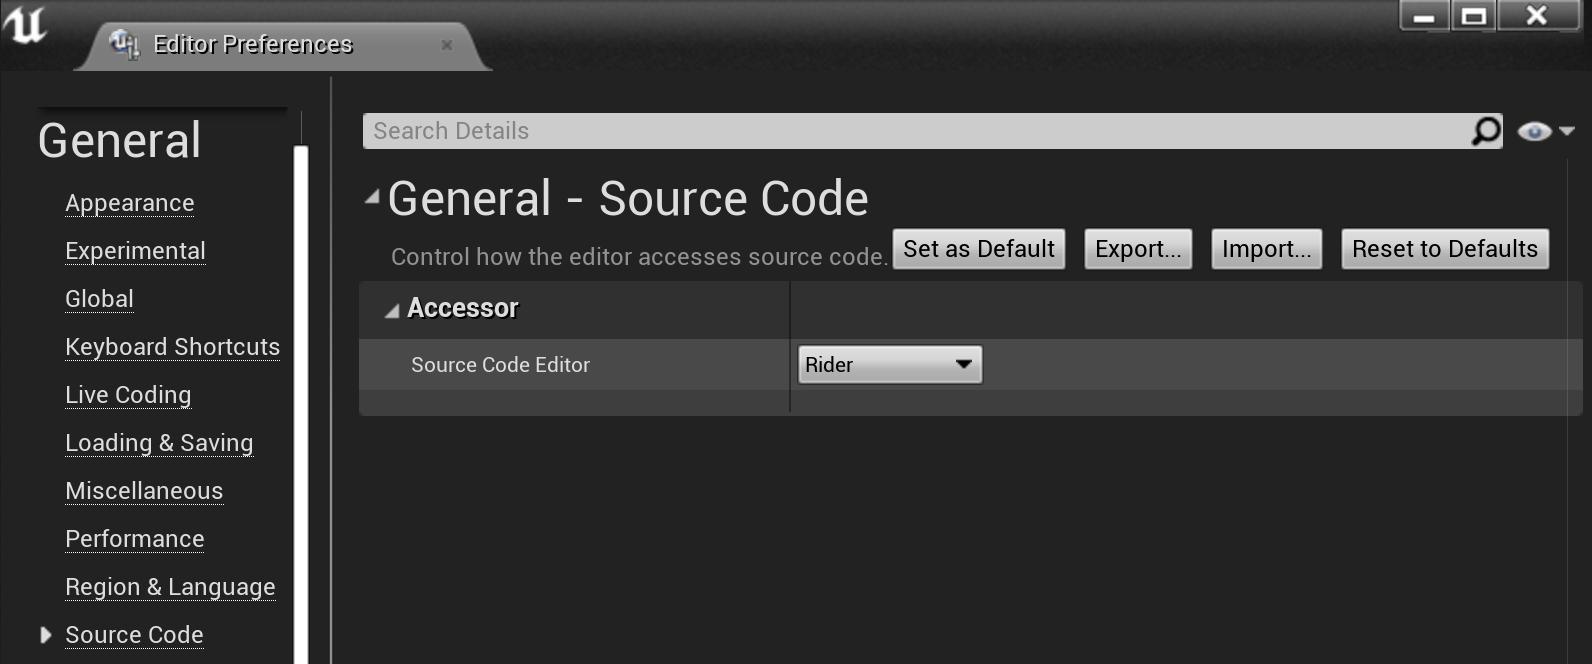 Unreal Editor: Editor Preferences | General | Source Code